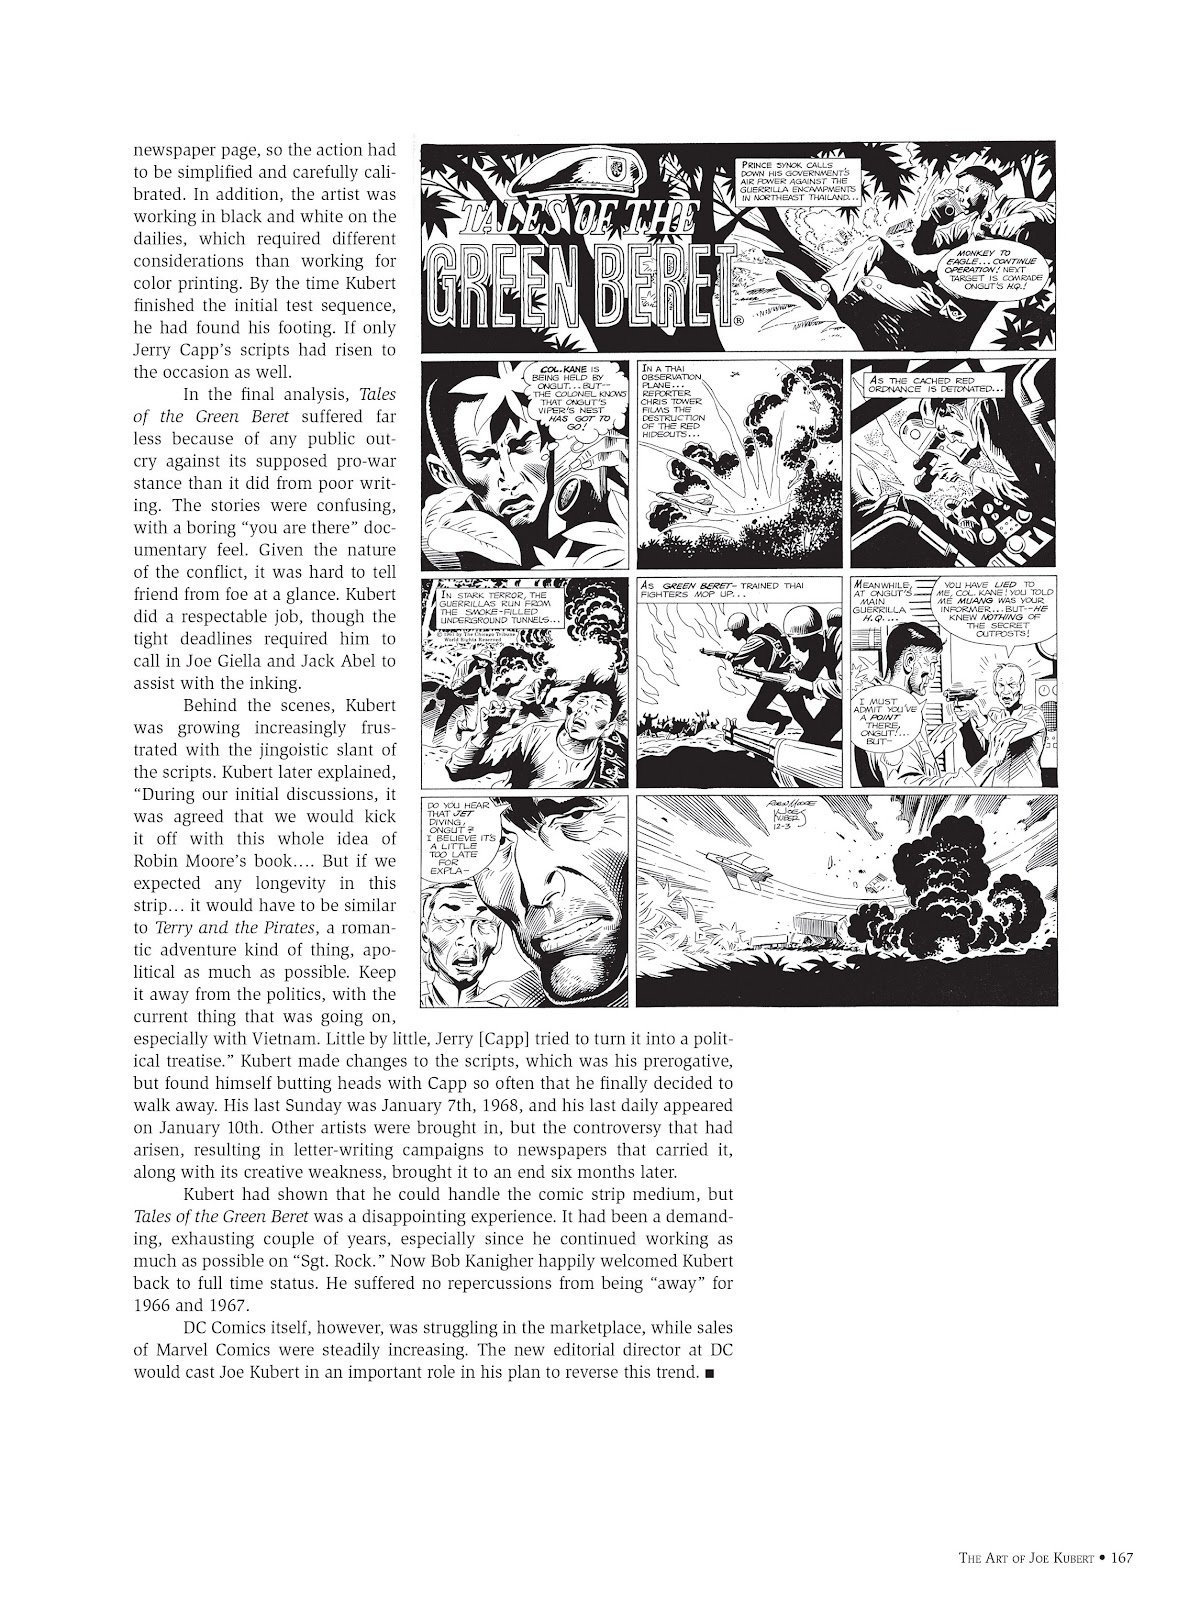 Read online The Art of Joe Kubert comic -  Issue # TPB (Part 2) - 67